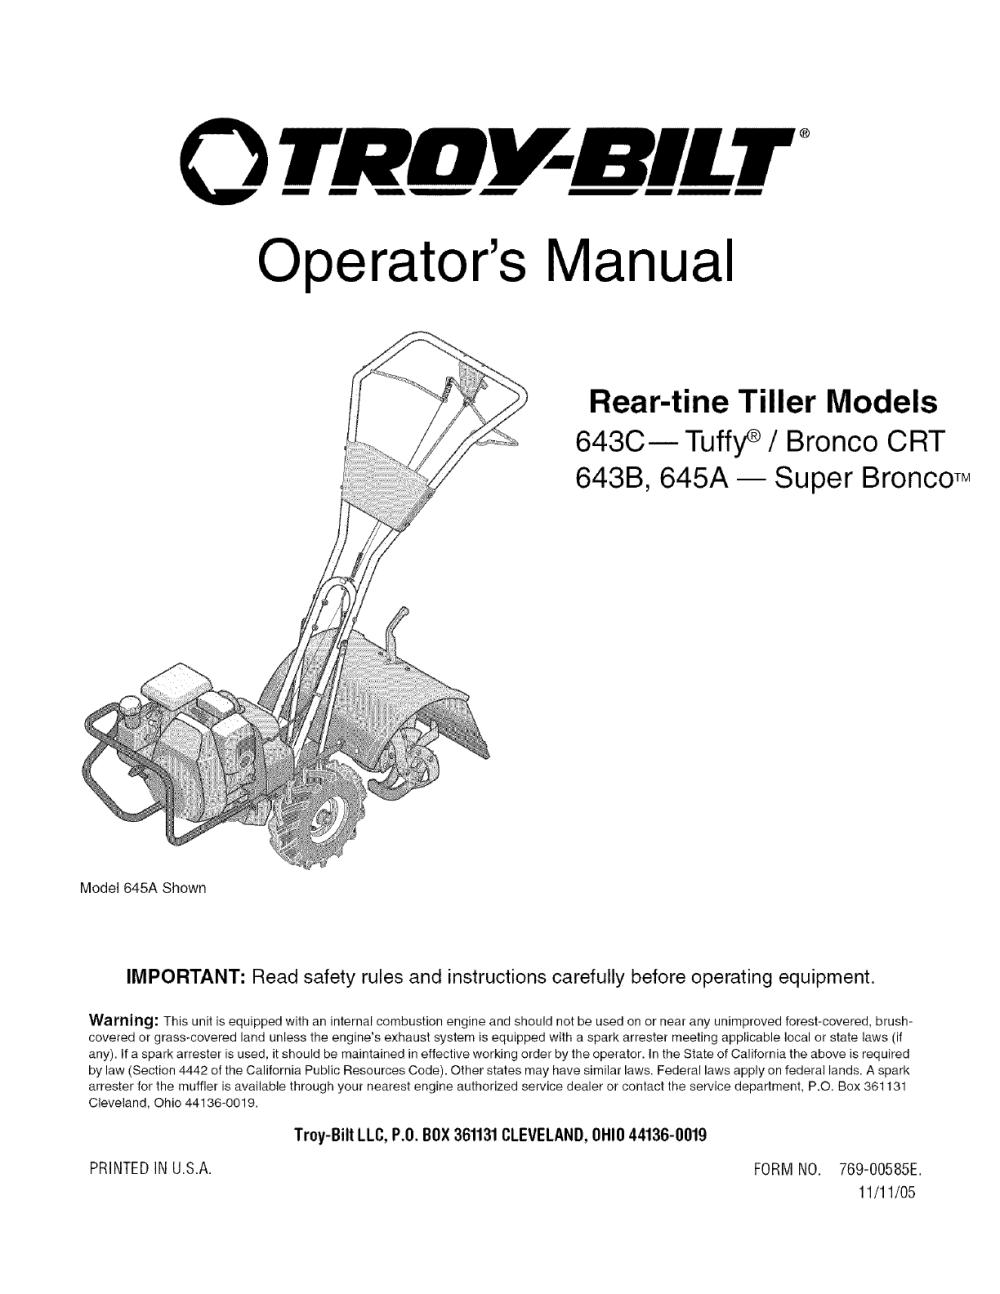 medium resolution of troybilt 21a 643b711 user manual rear tine tiller manuals and guides l0601227